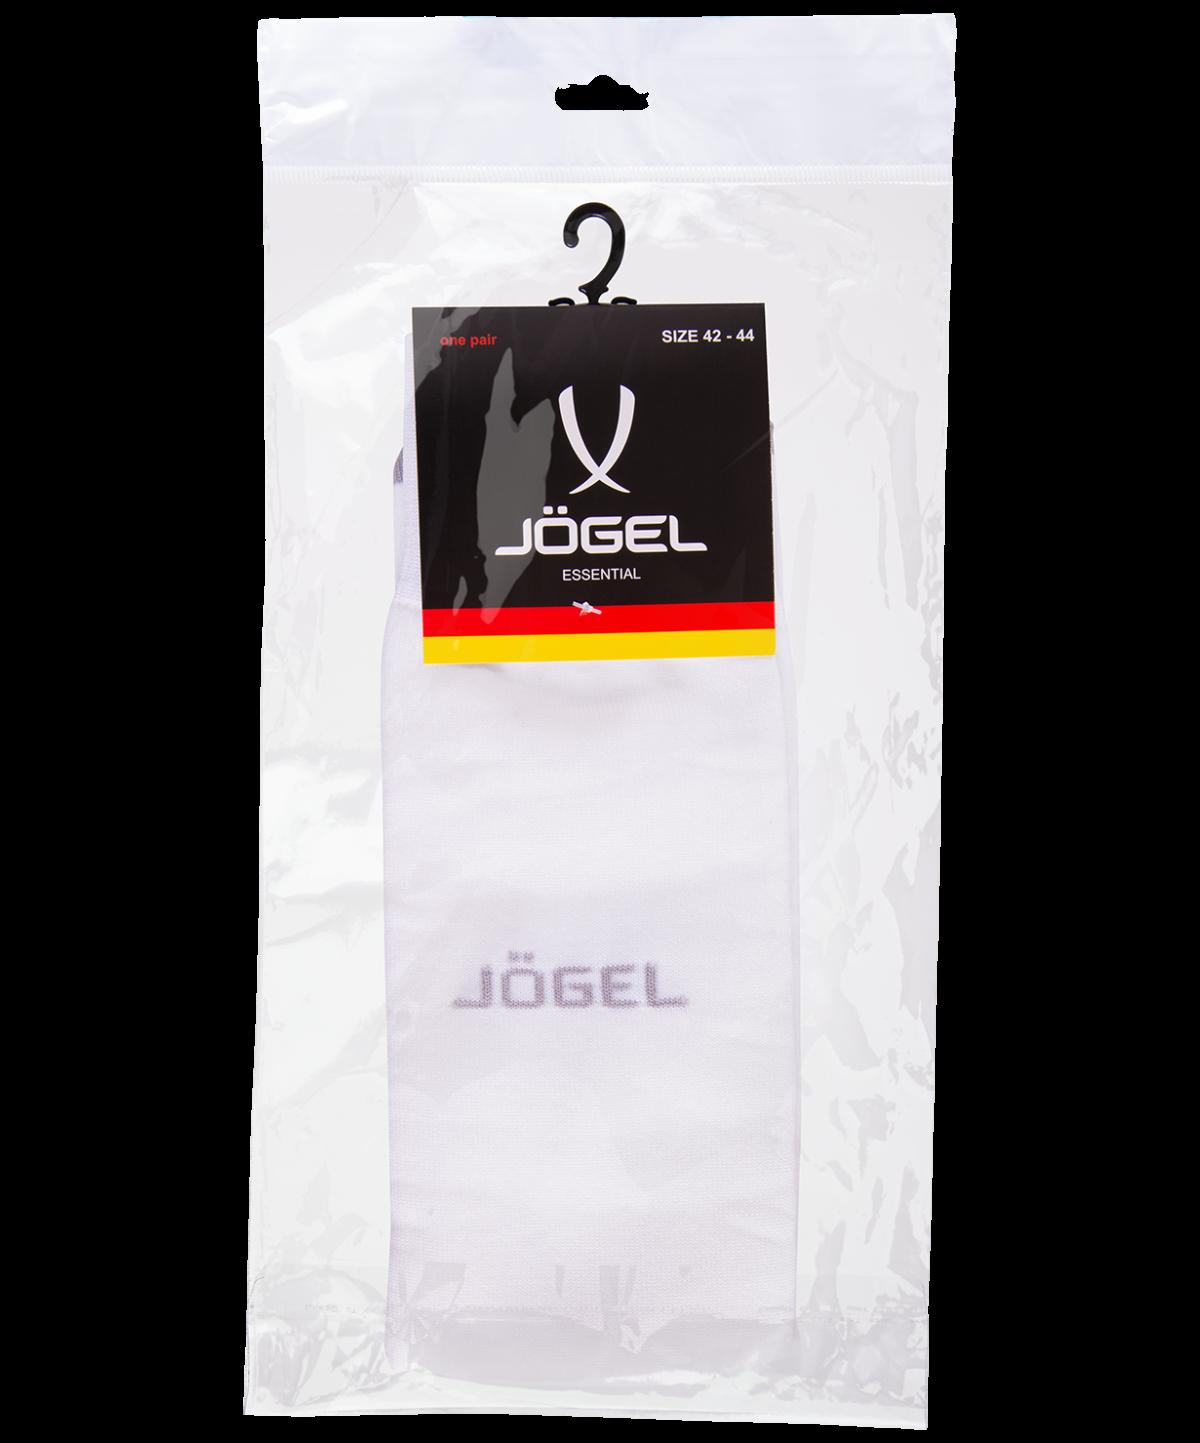 JOGEL Гетры футбольные Essentiаl, белый/серый  JA-006 - 4